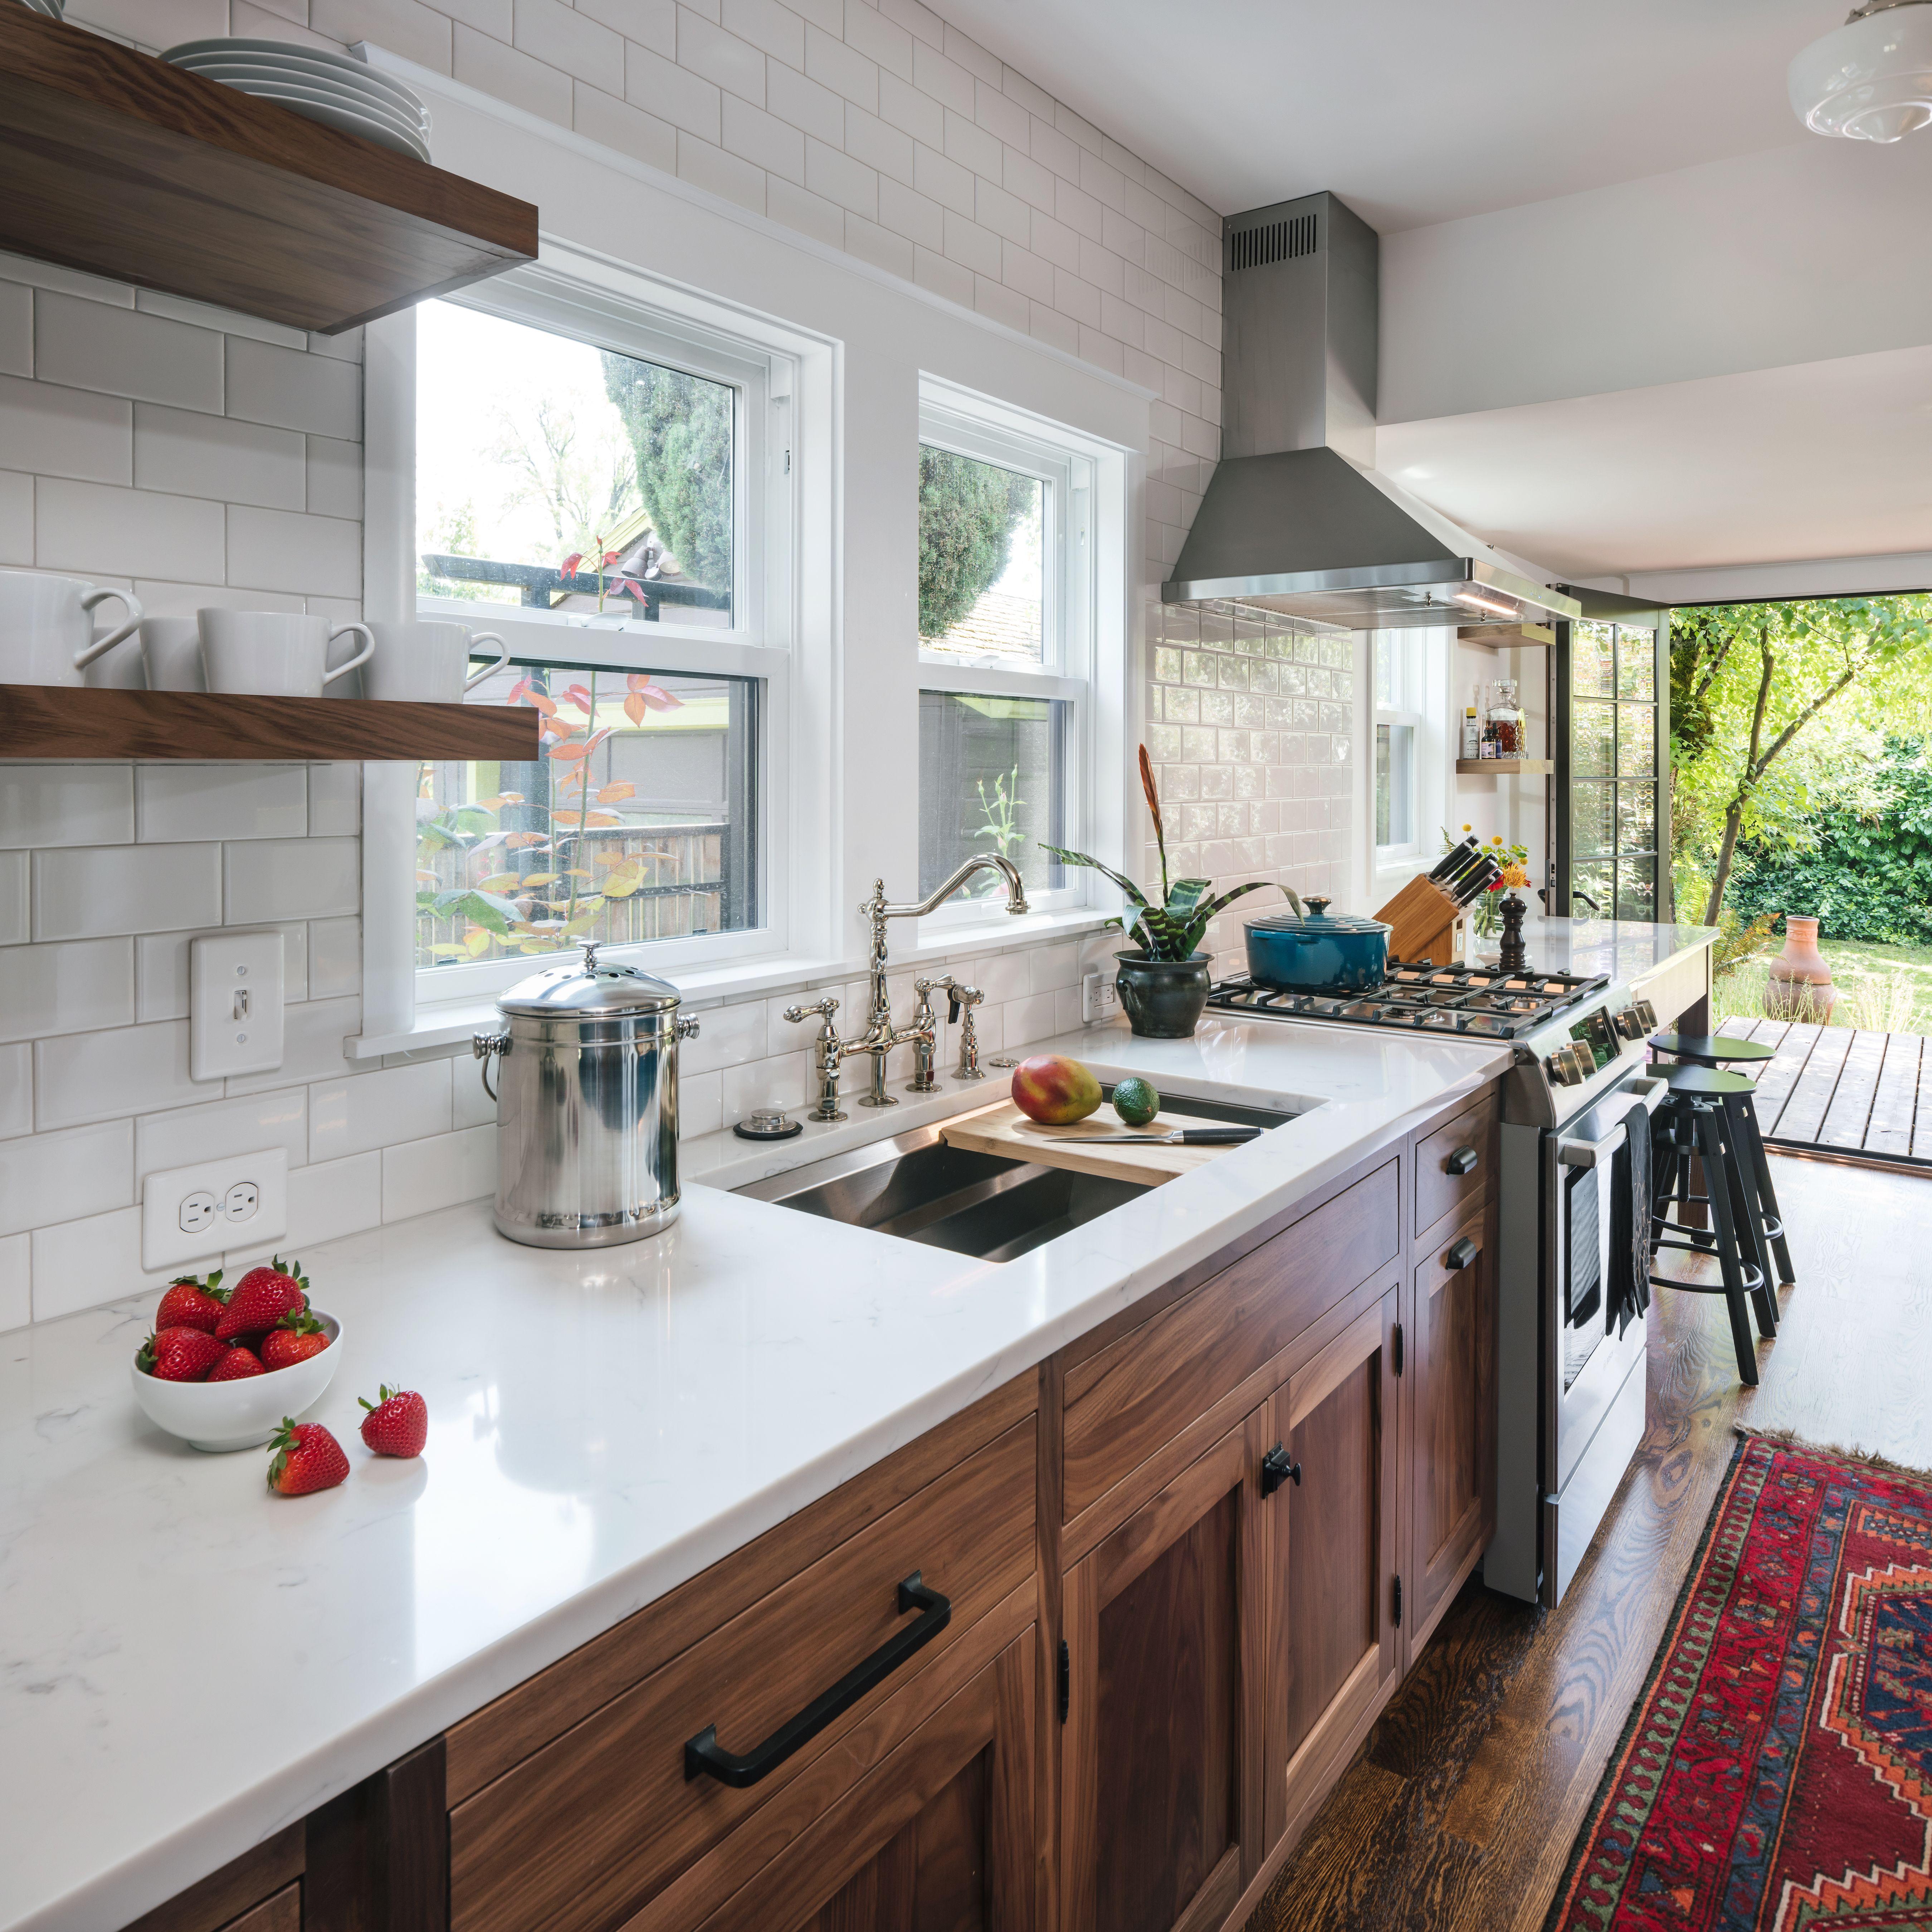 Modern Bohemian Kitchen Remodel In Portland Or Before After Kitchen Remodel Kitchen Bathroom Remodel Kitchen Design